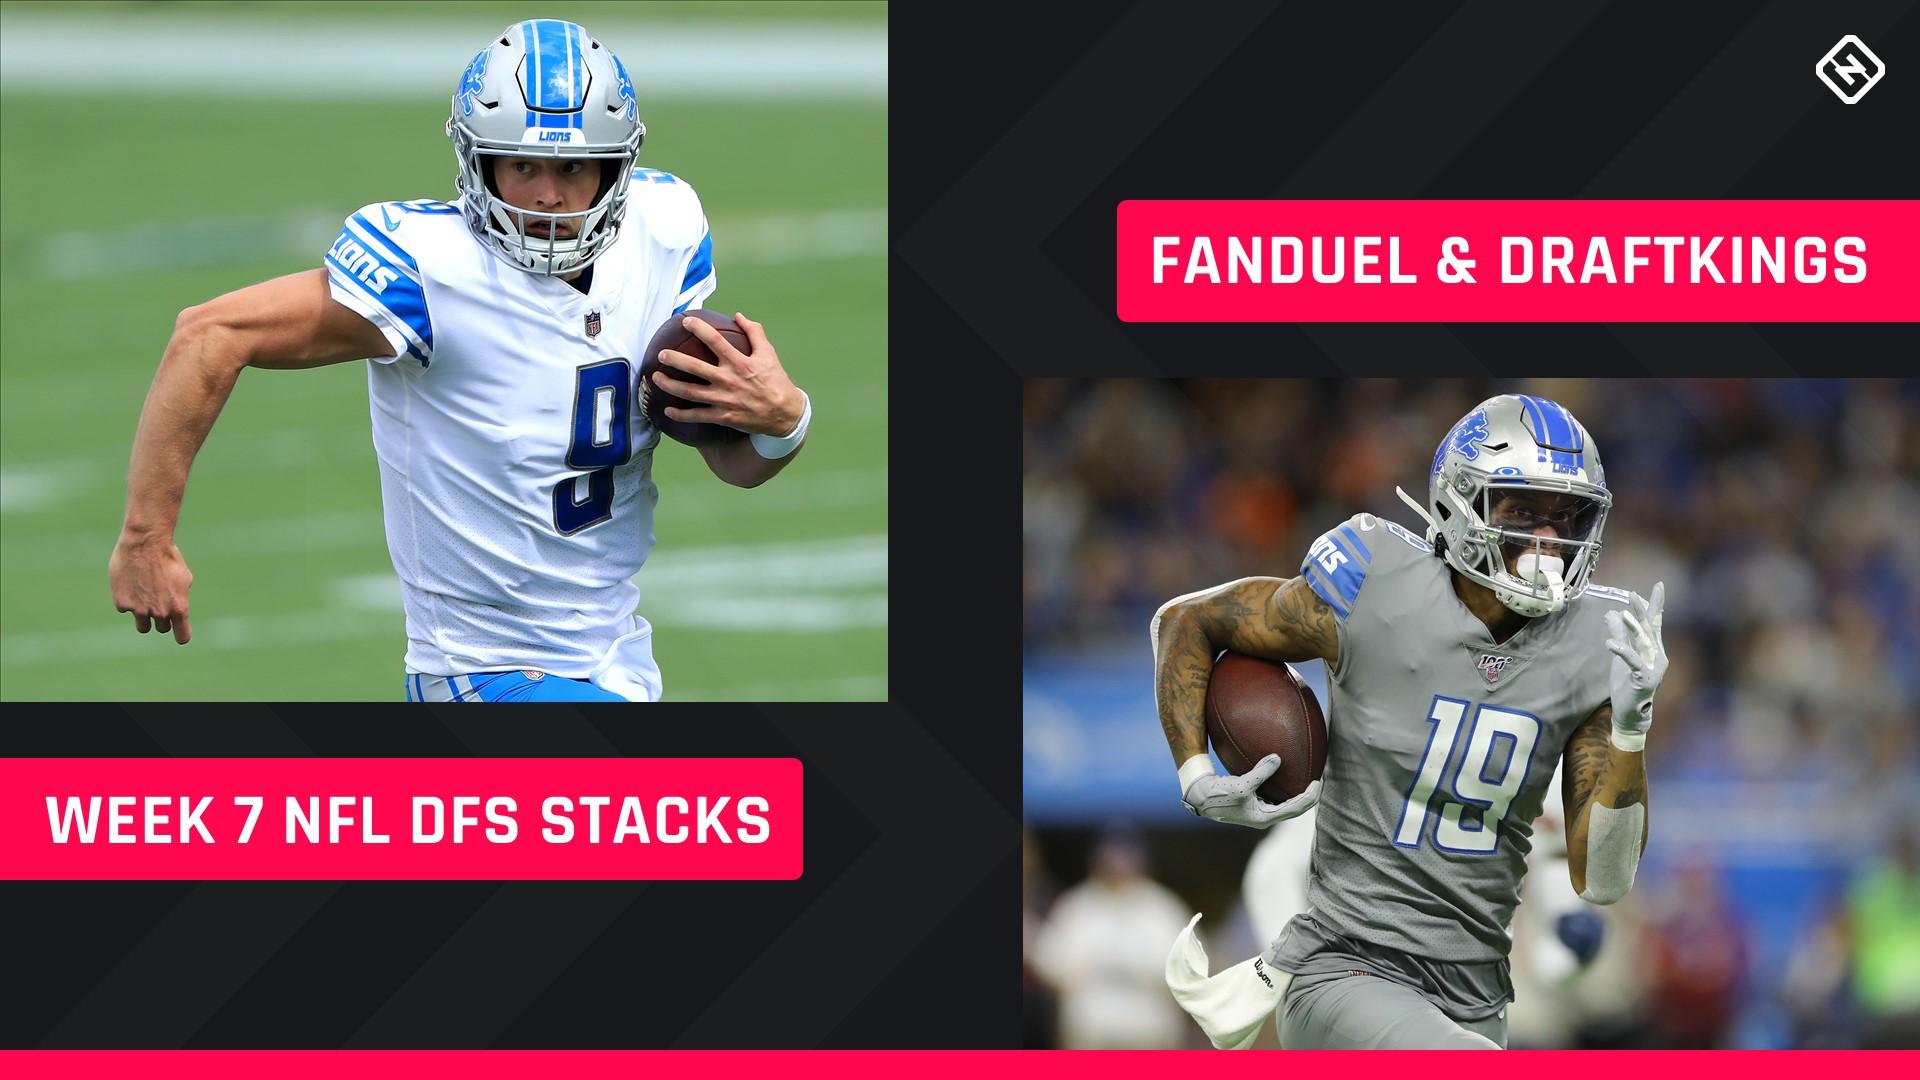 Week 7 Nfl Dfs Stacks Best Lineup Picks For Draftkings Fanduel Tournaments Cash Games Sporting News